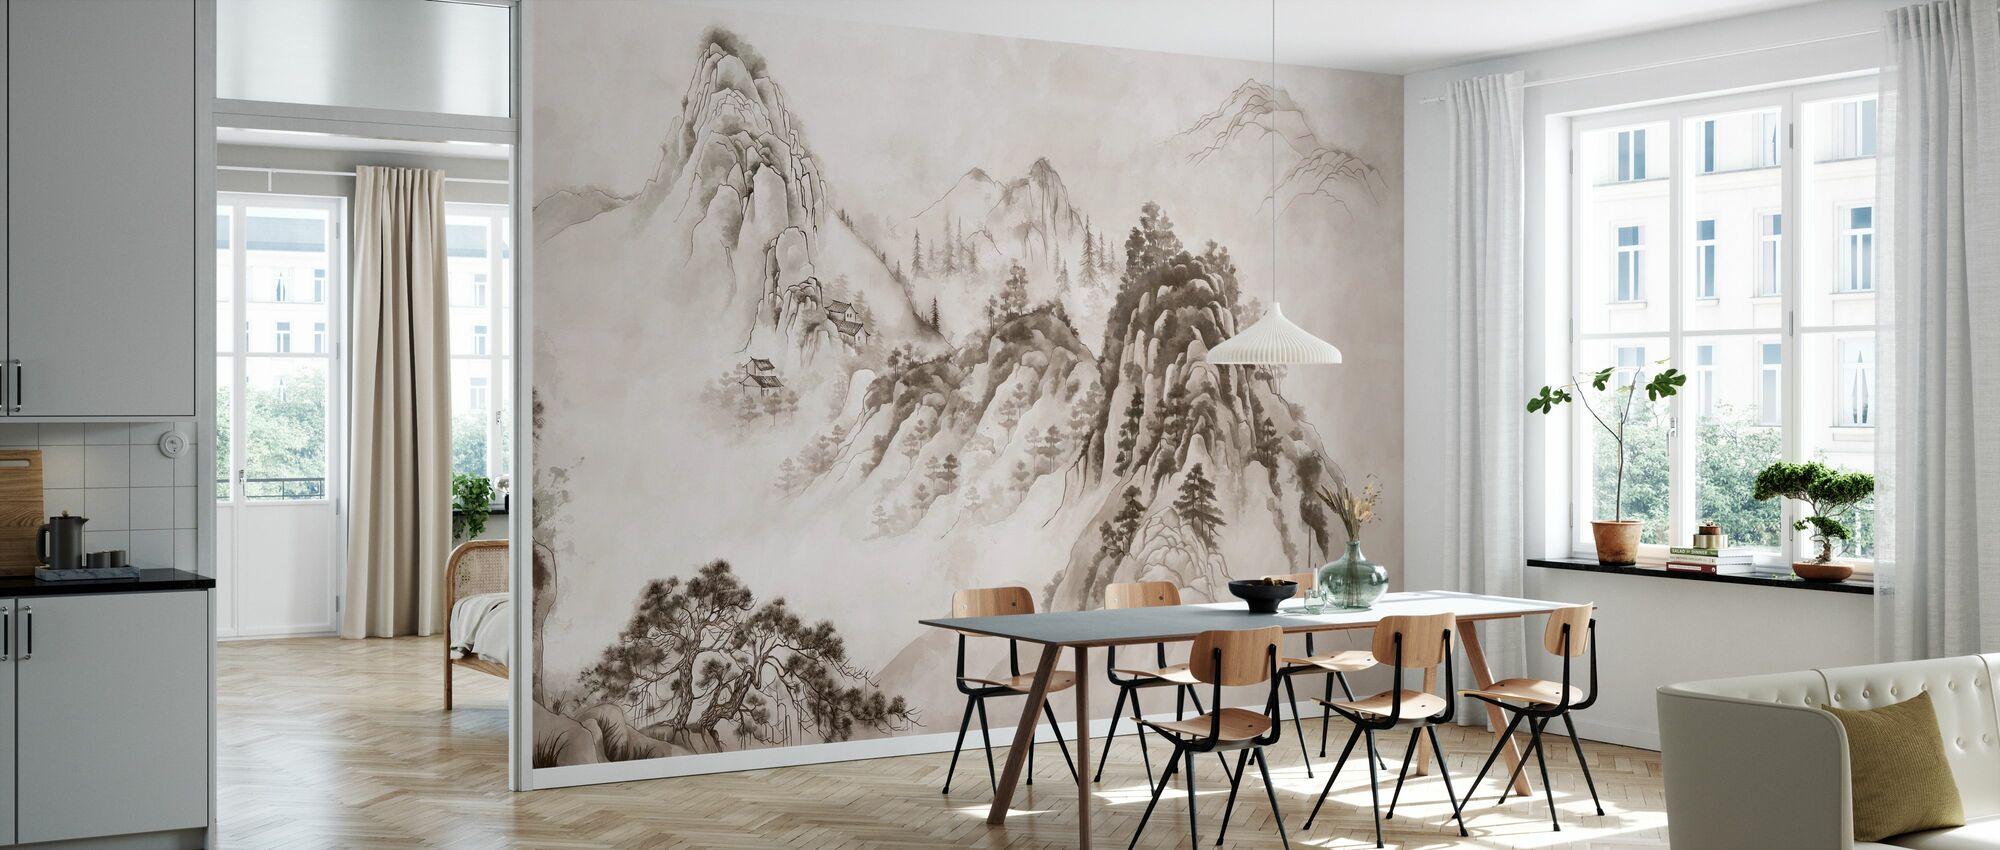 Zen Mountain Monastery - Wallpaper - Kitchen